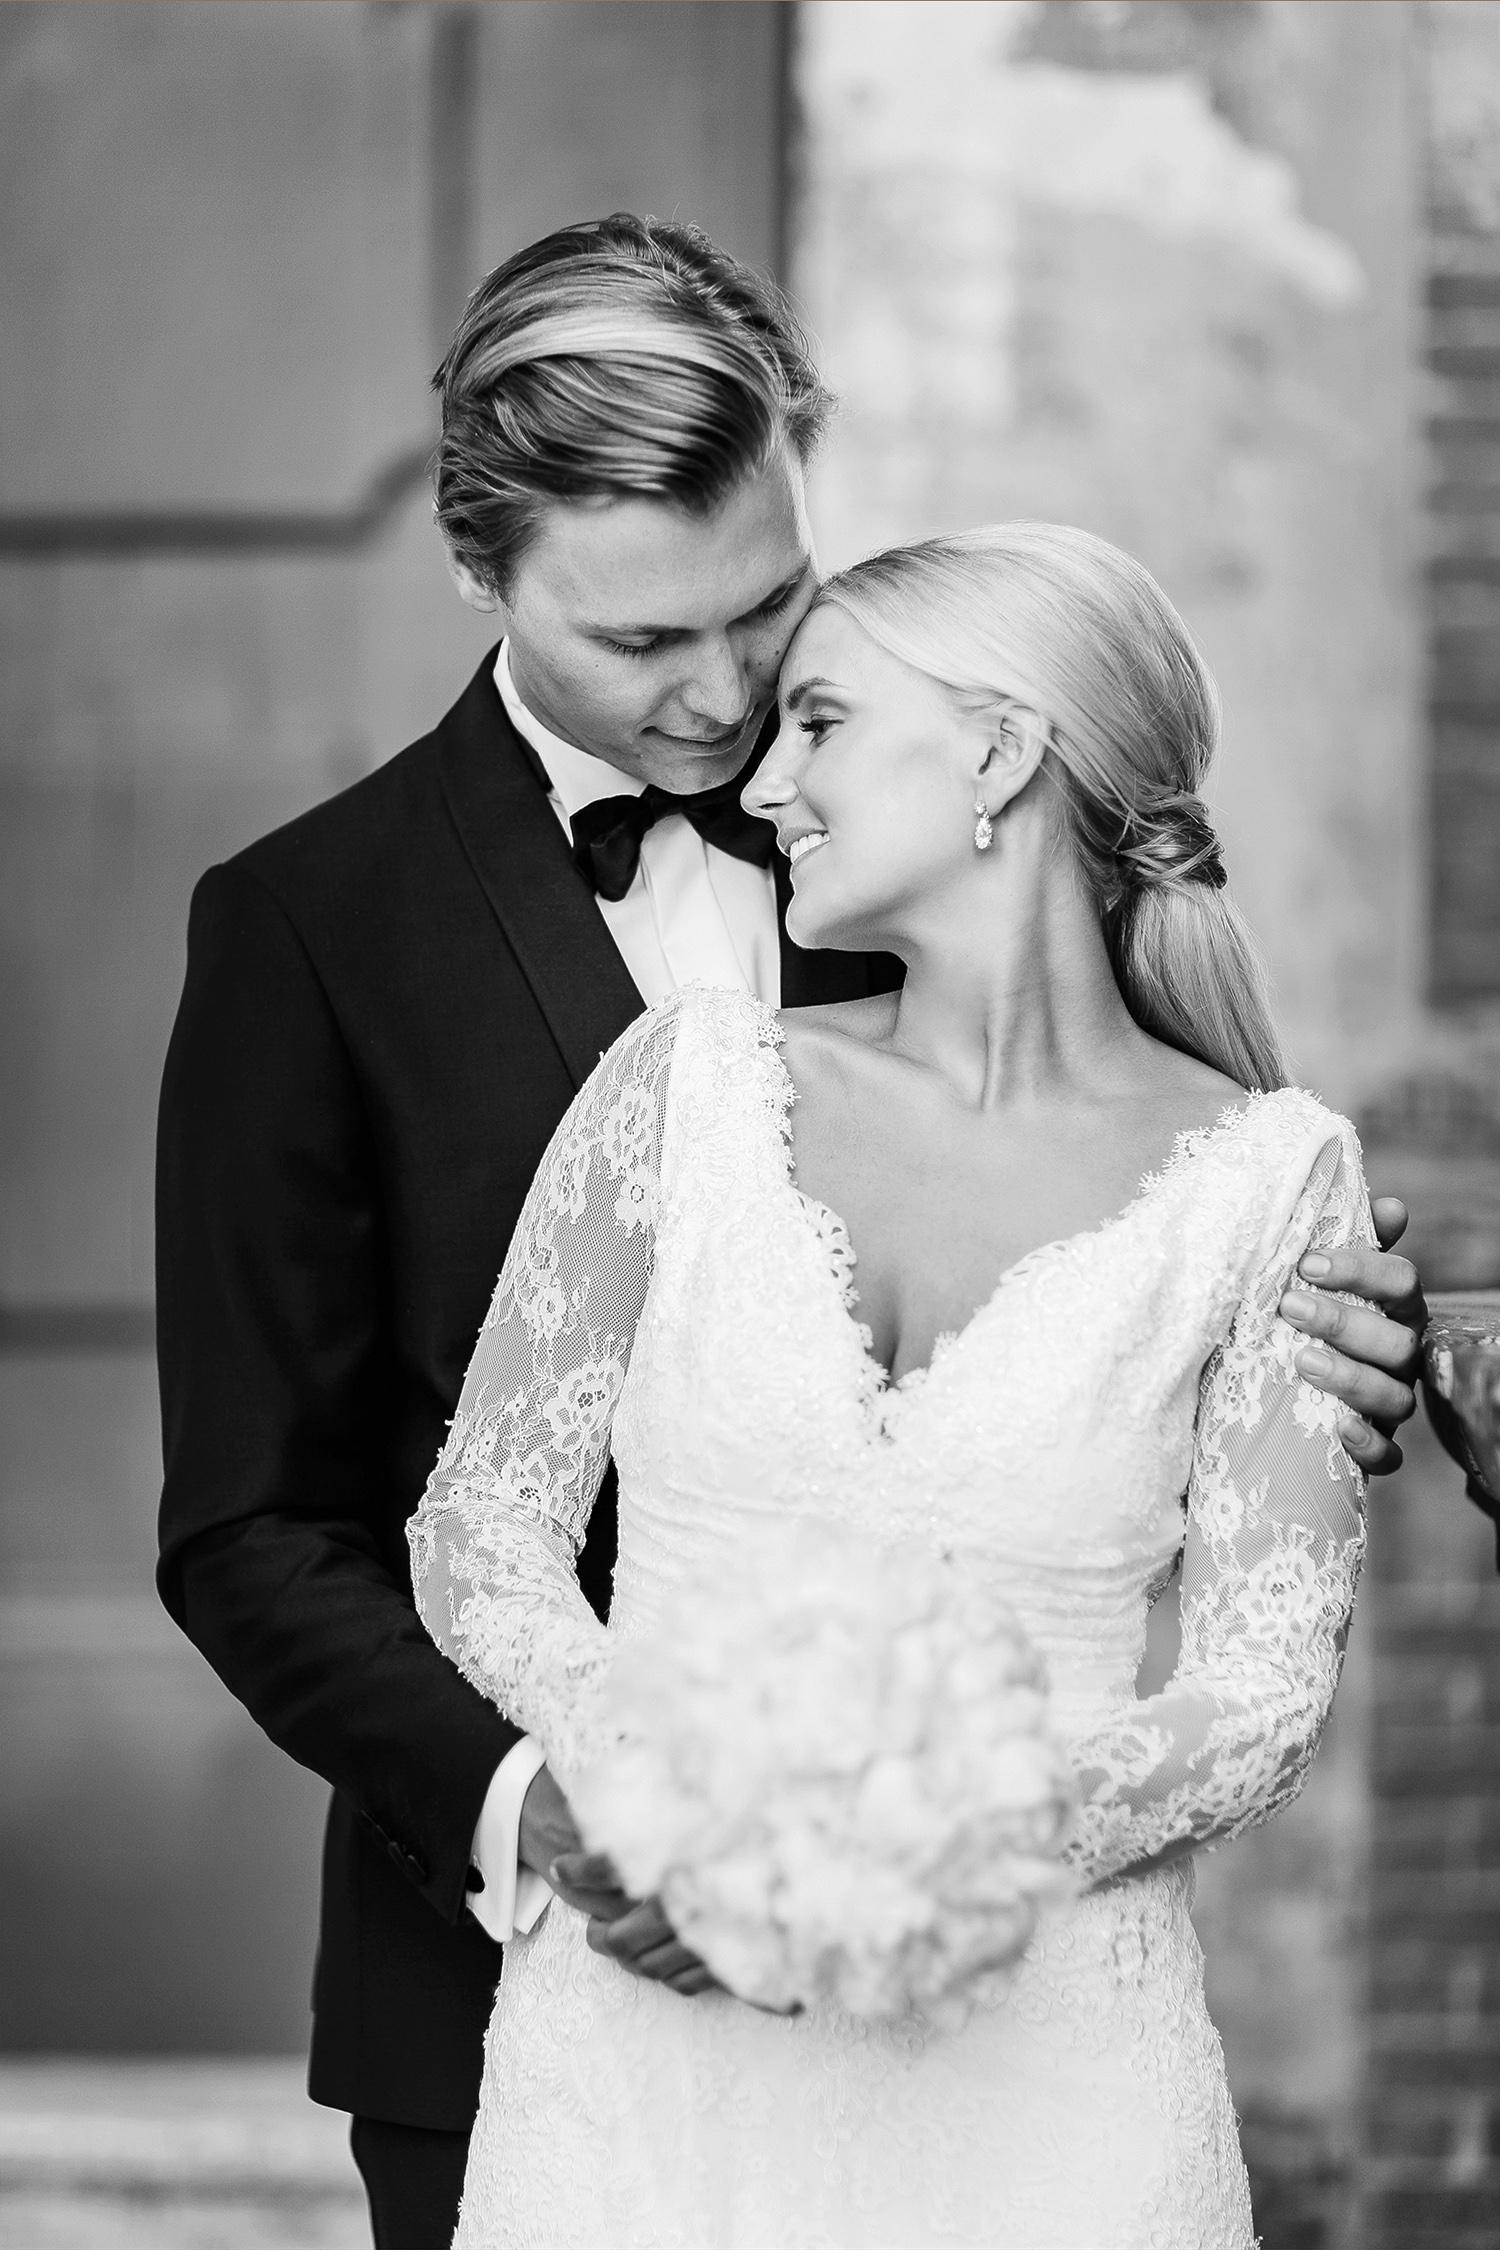 nora-wedding-photographer-marbella-spain-taylor-content.jpg